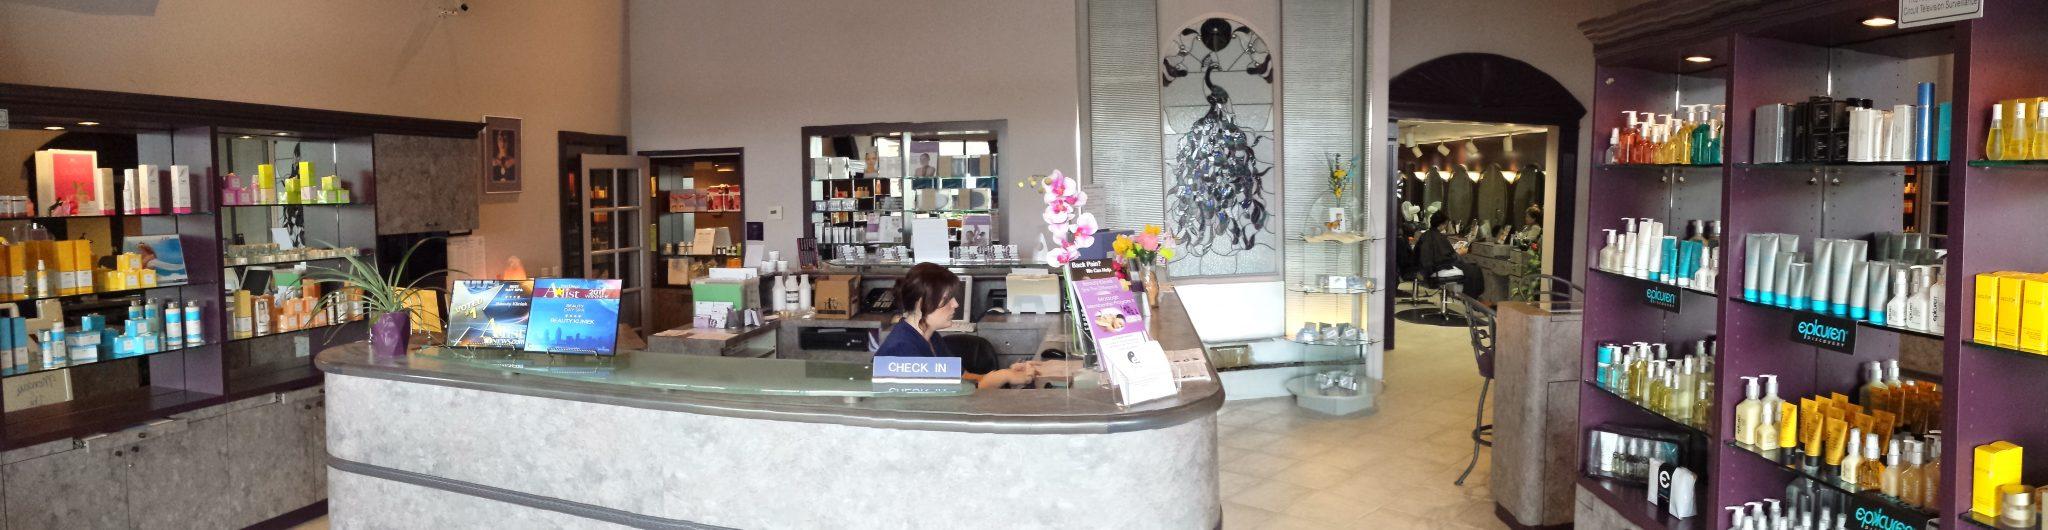 Beauty Kliniek Aromatherapy Day Spa Front Desk